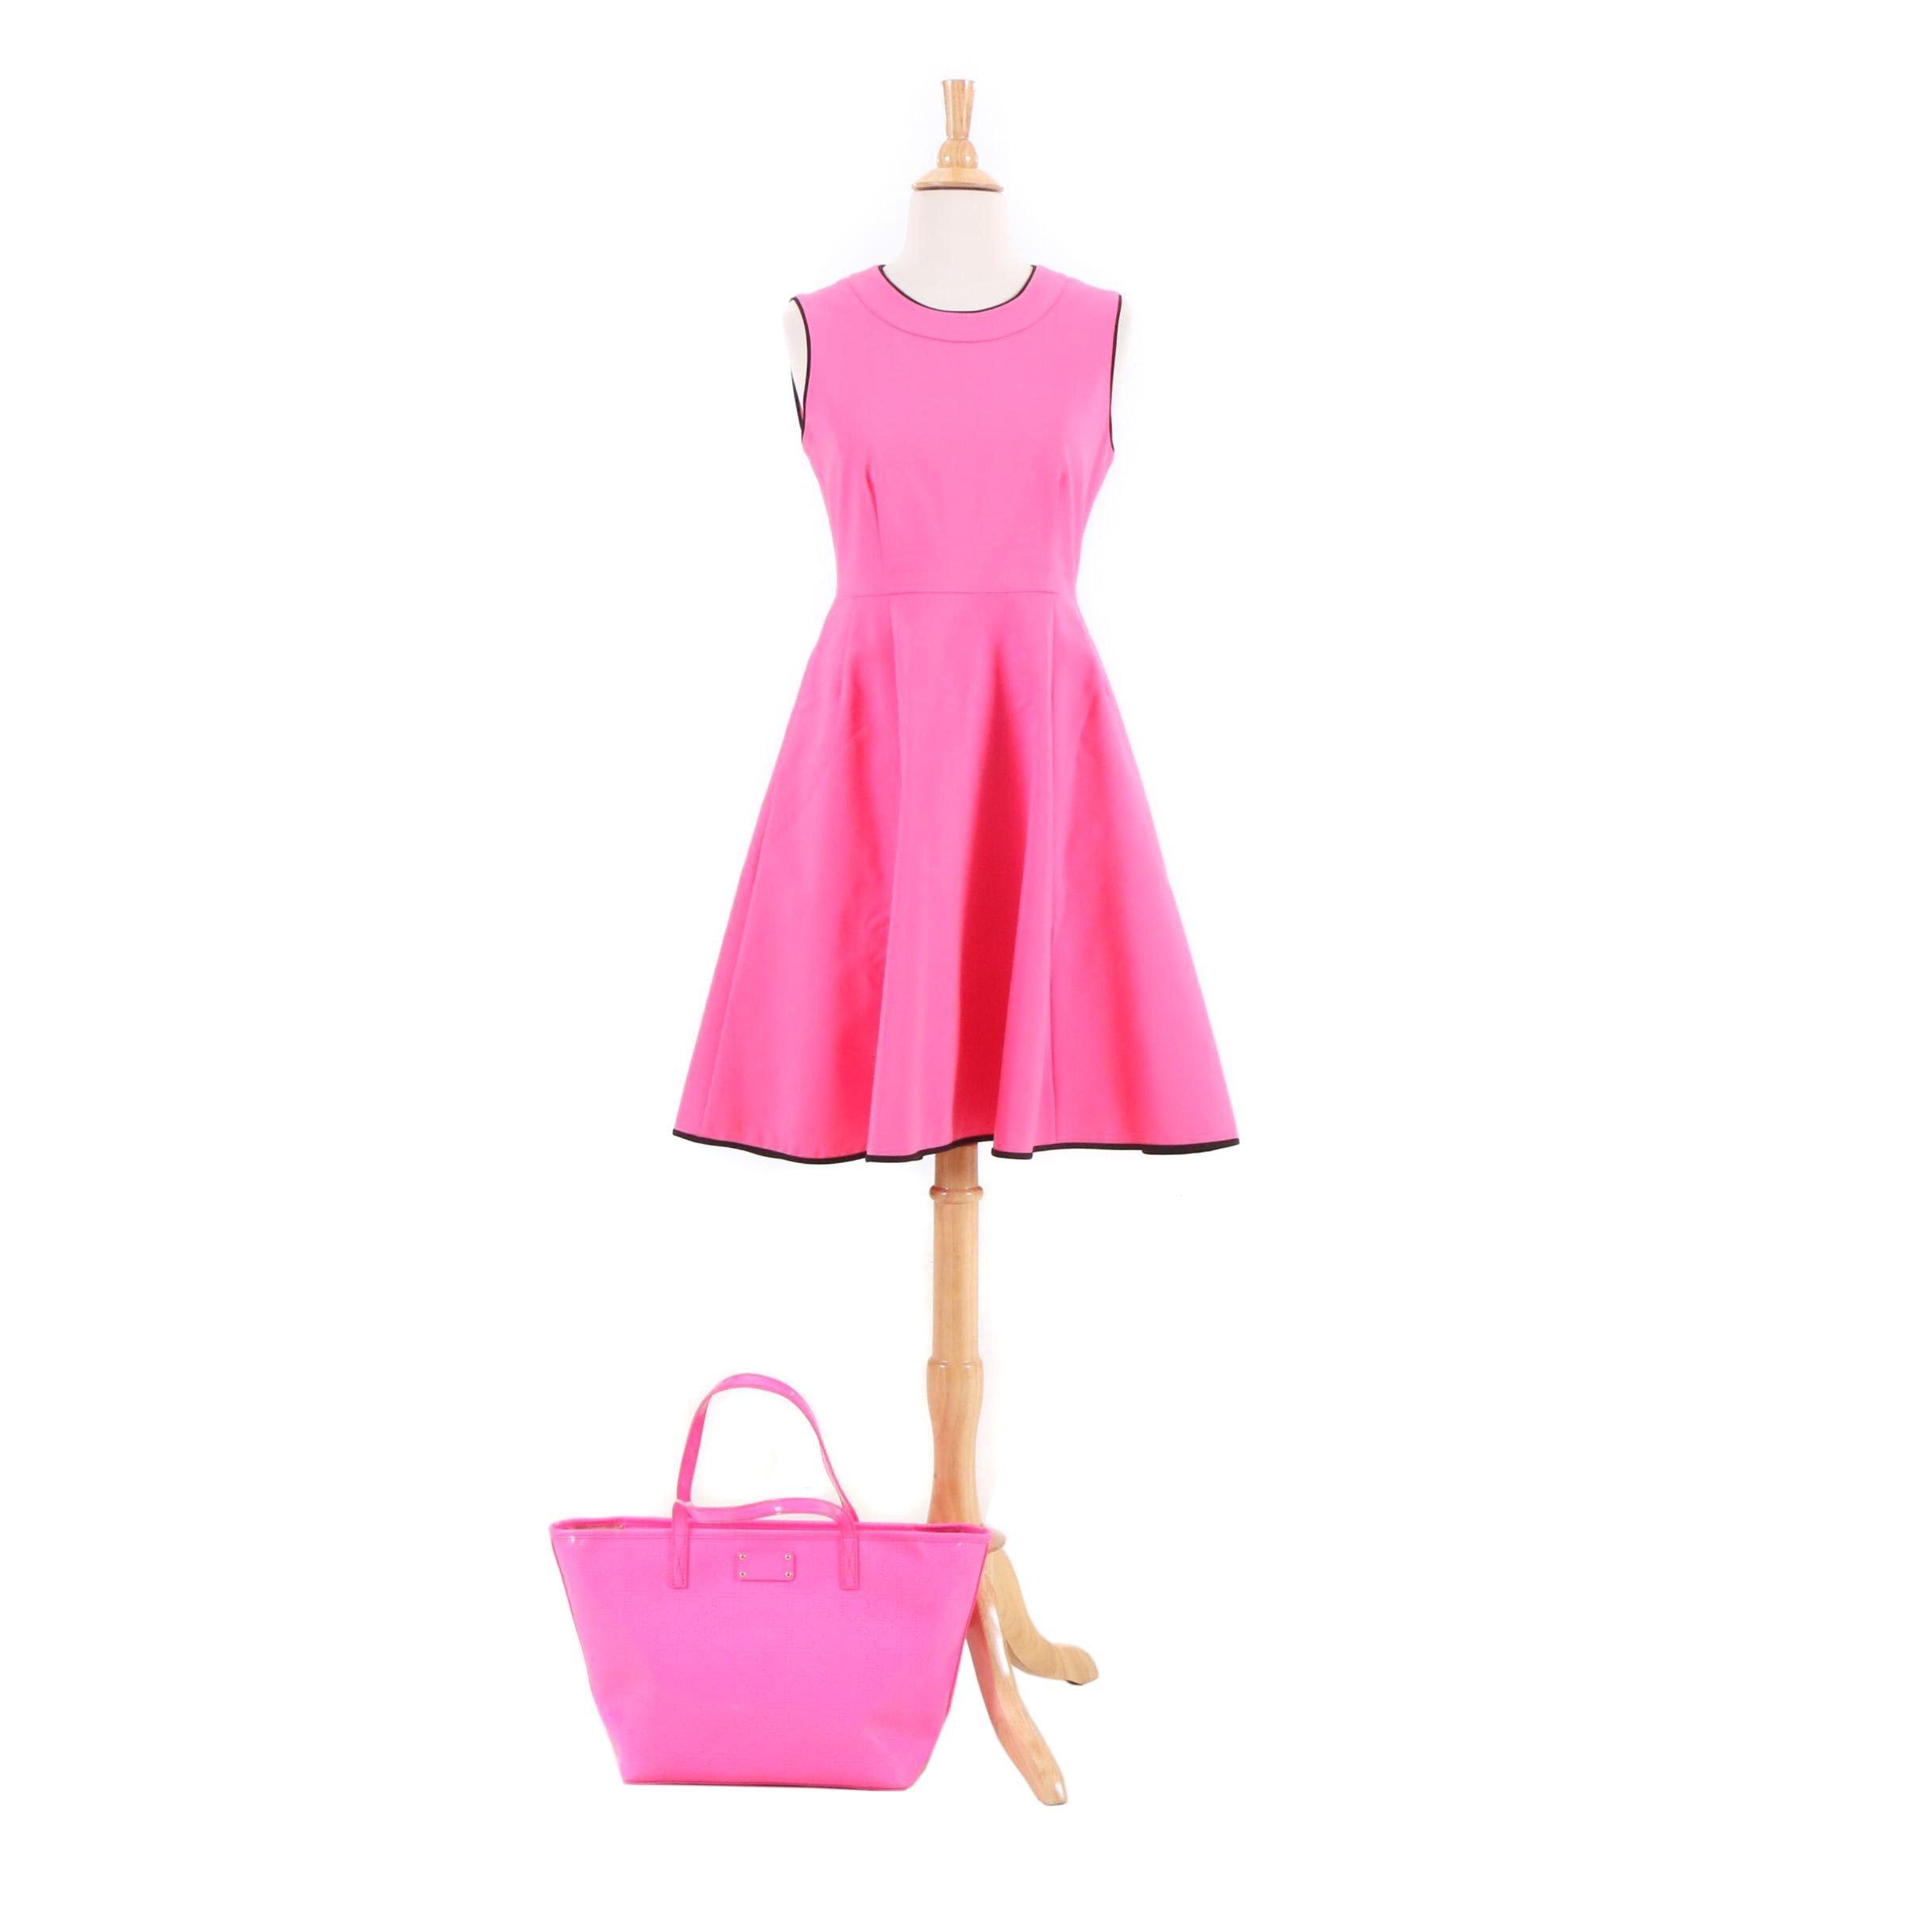 Kate Spade Pink Carol Dress and Hot Pink Harmony Metro Perforated Tote Bag